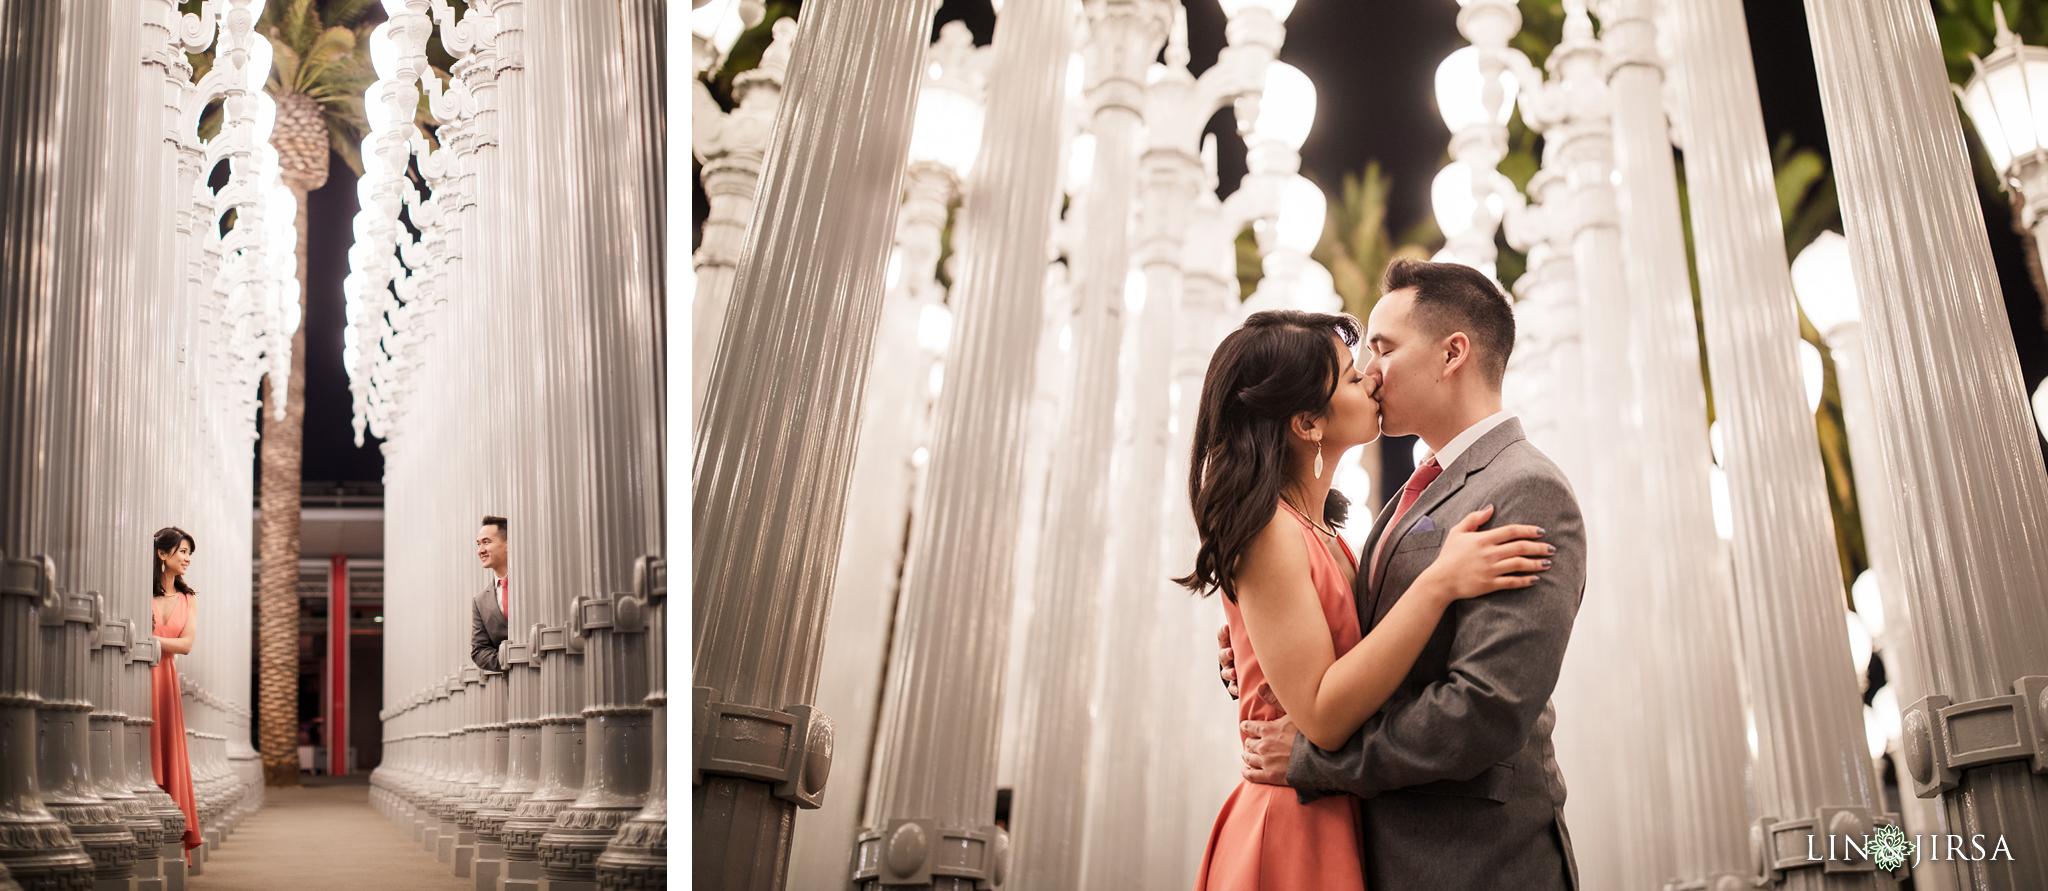 17 LACMA los angeles engagement photography